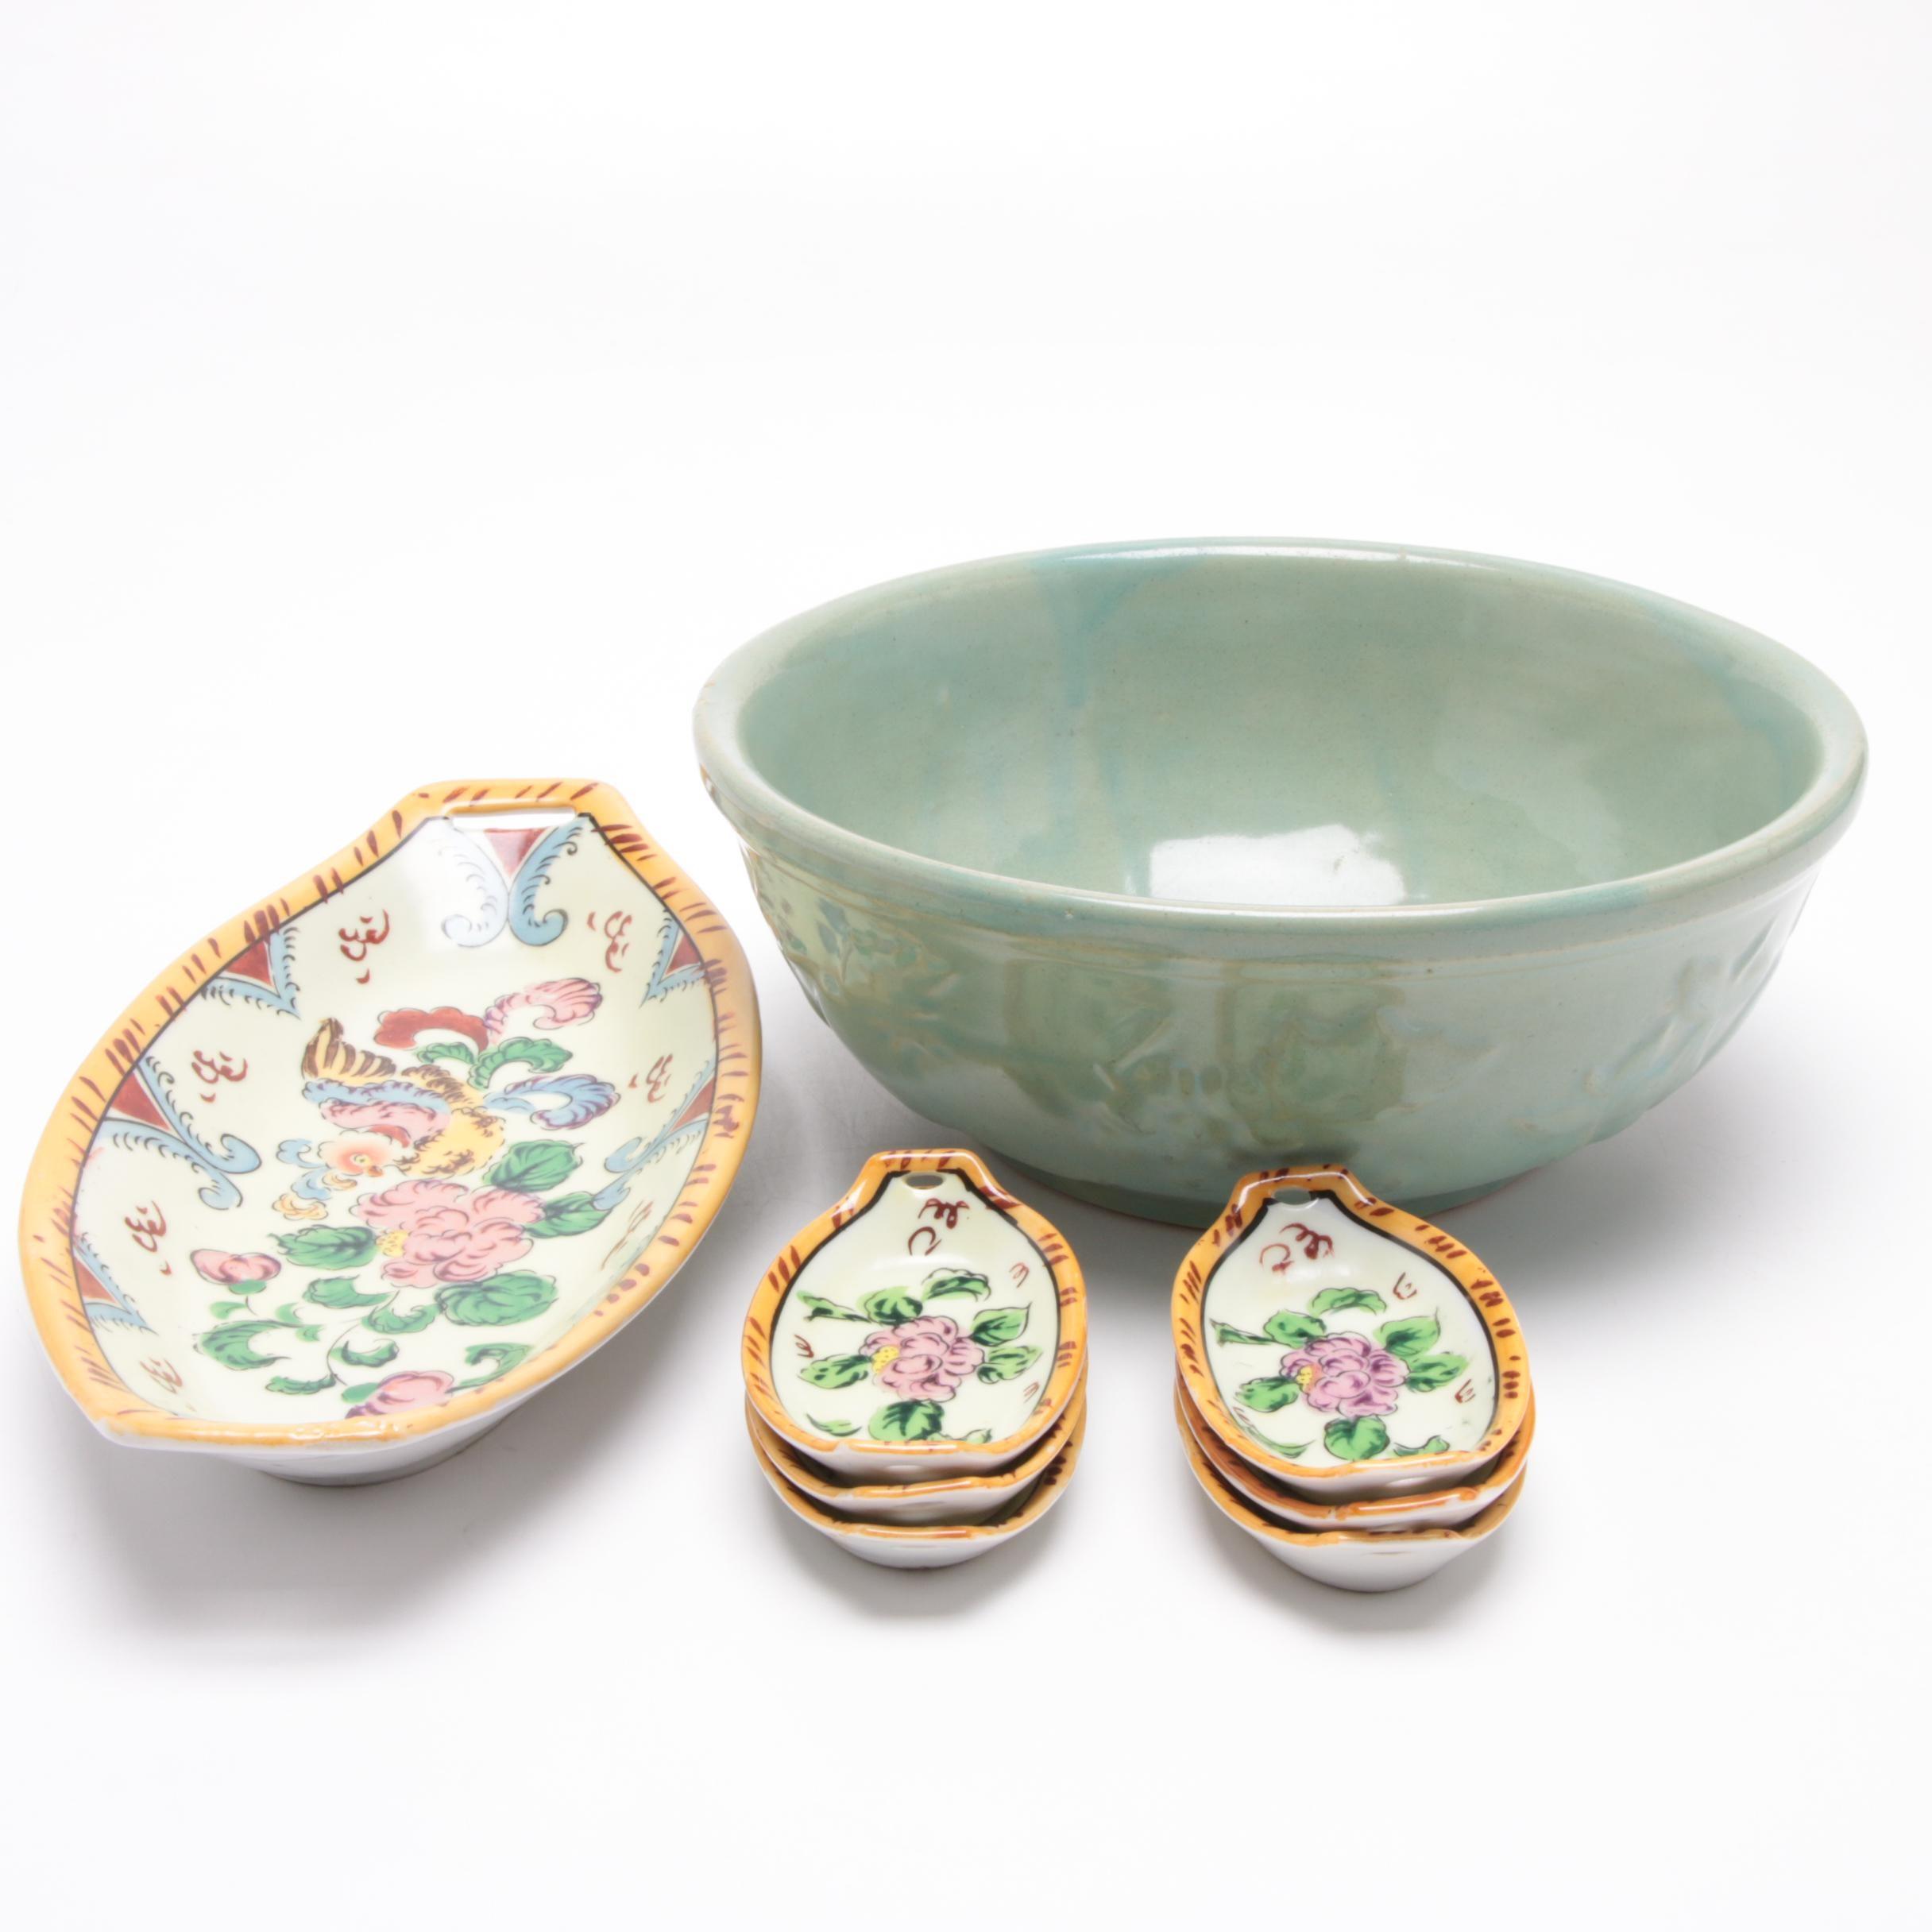 Takito Ceramic Serveware and American-Made Vegetable Bowl